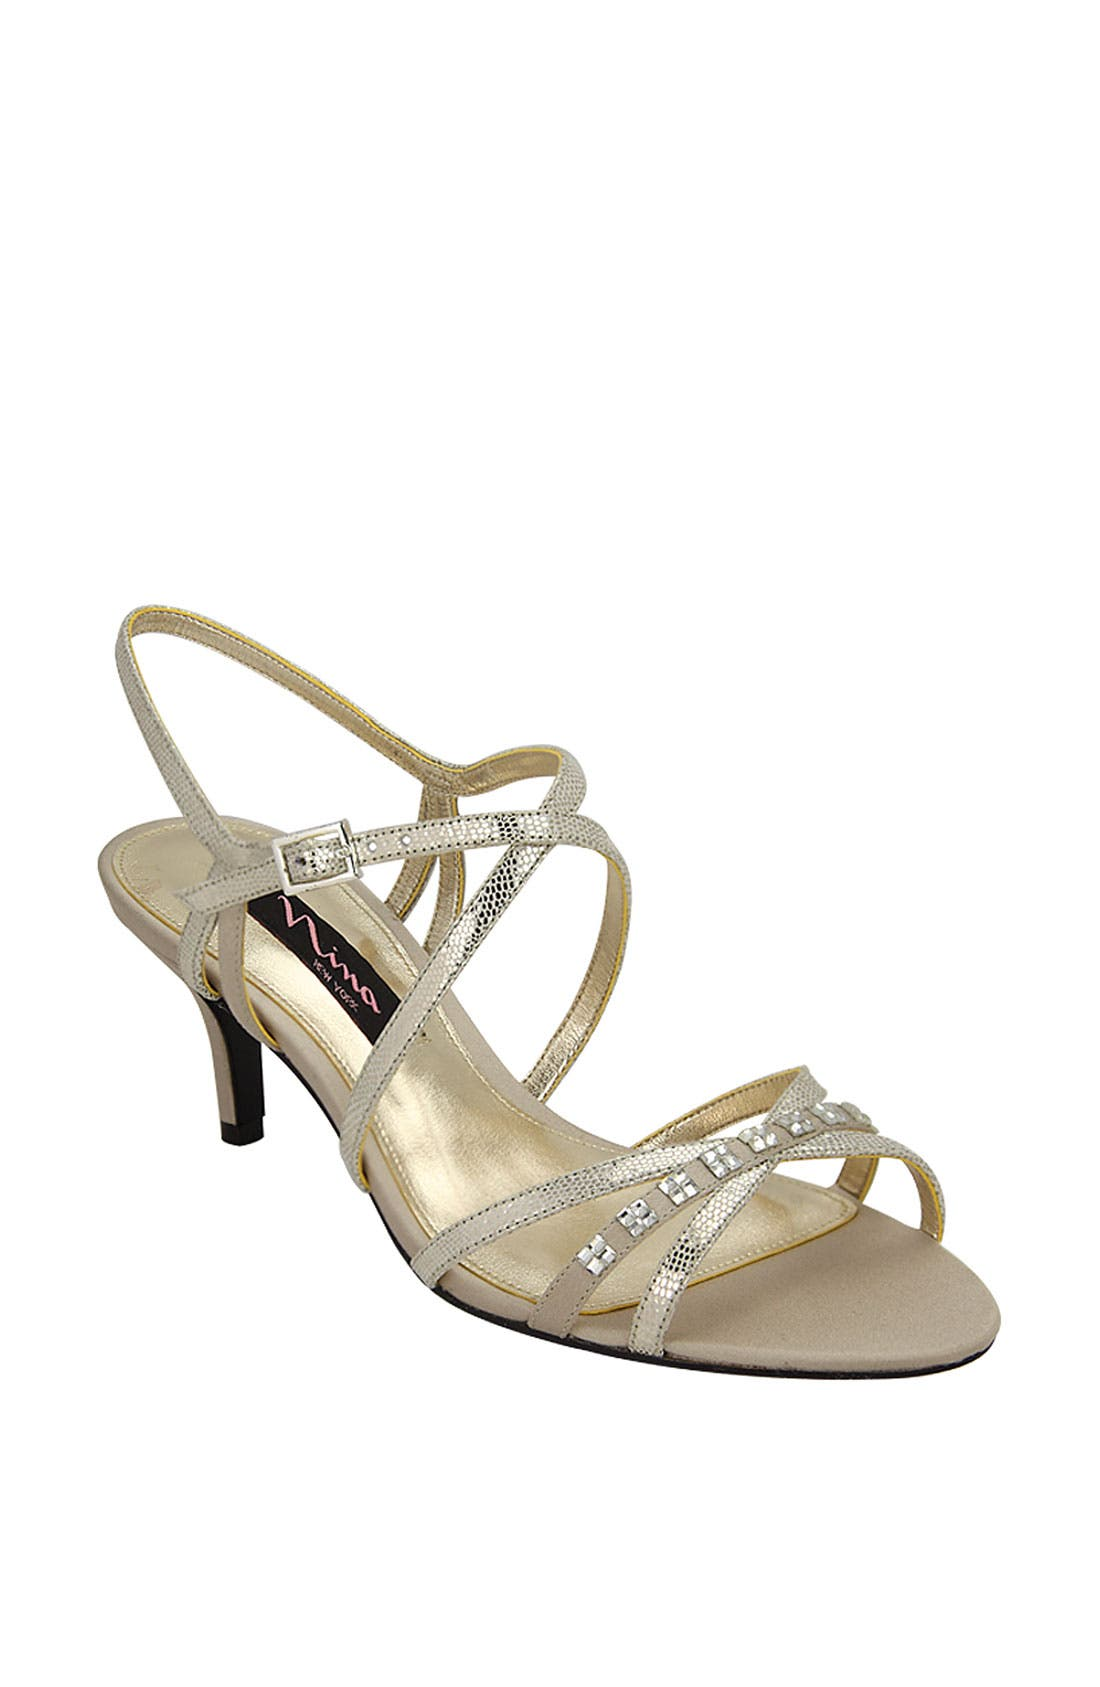 Alternate Image 1 Selected - Nina 'Curran' Sandal